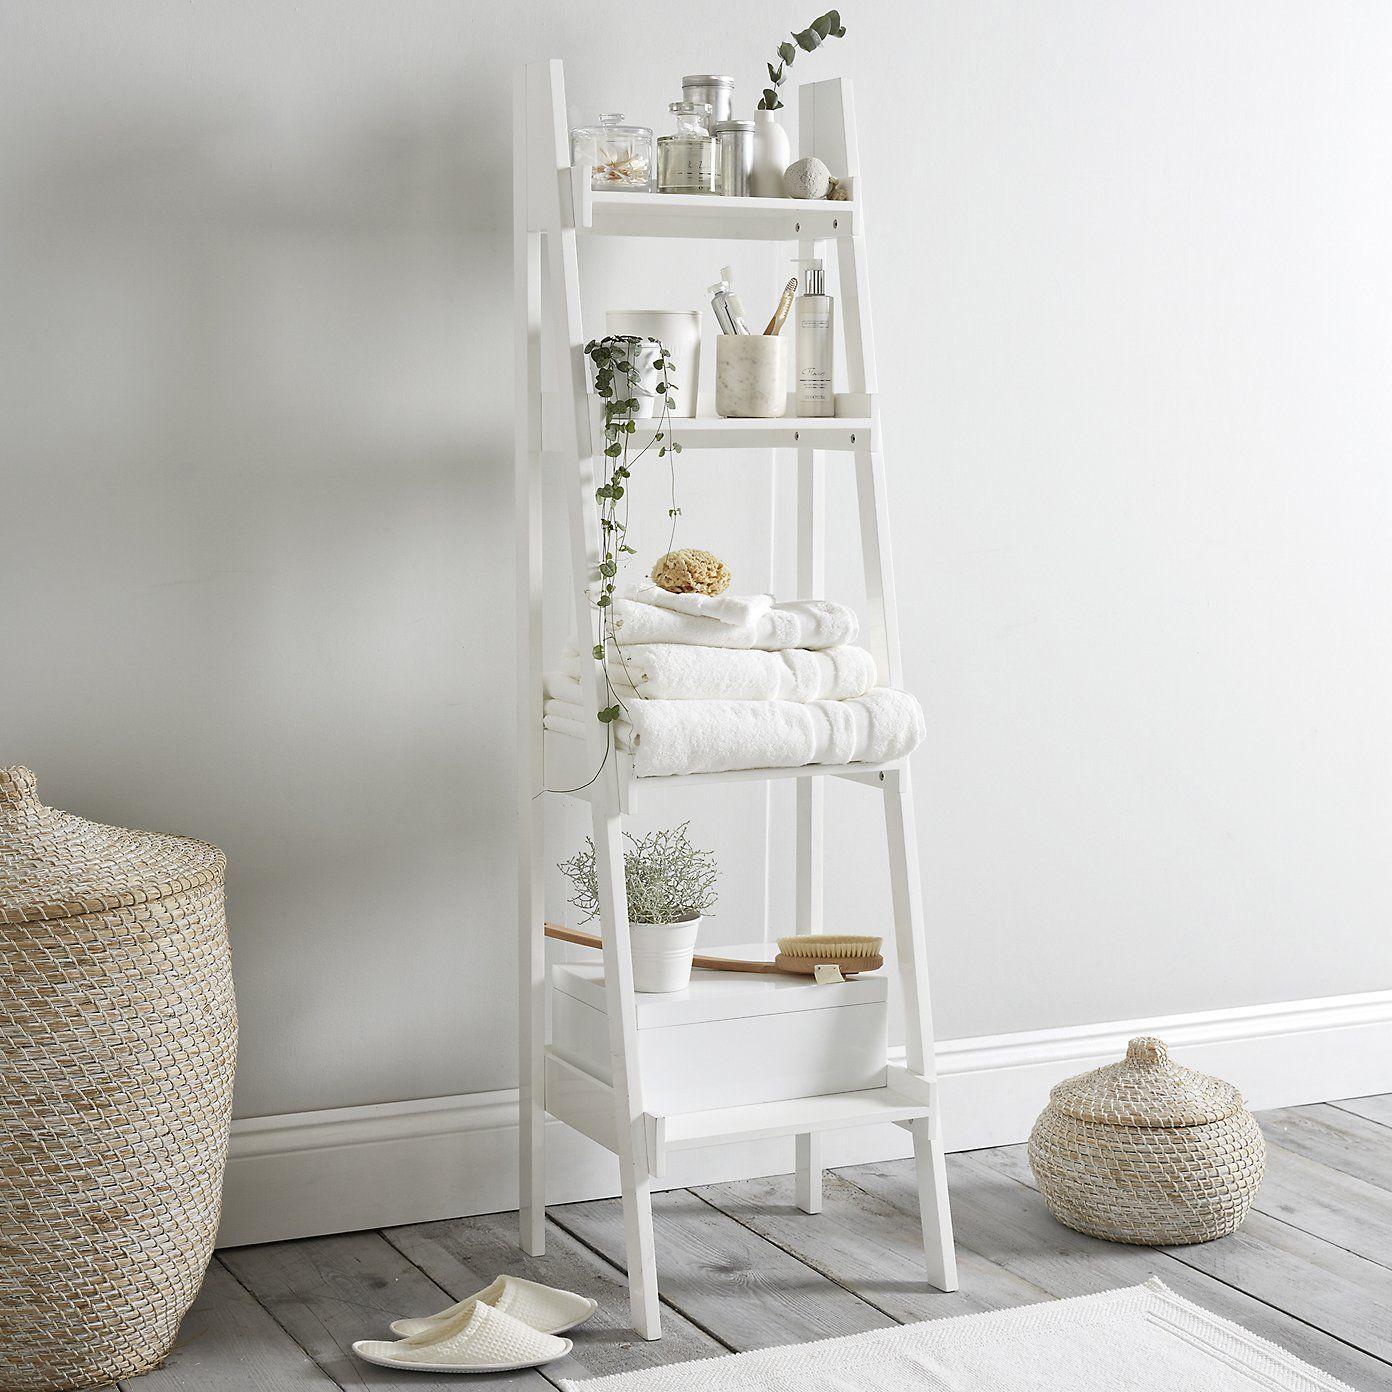 Bathroom Lacquer Ladder Shelf Cabinets & Units